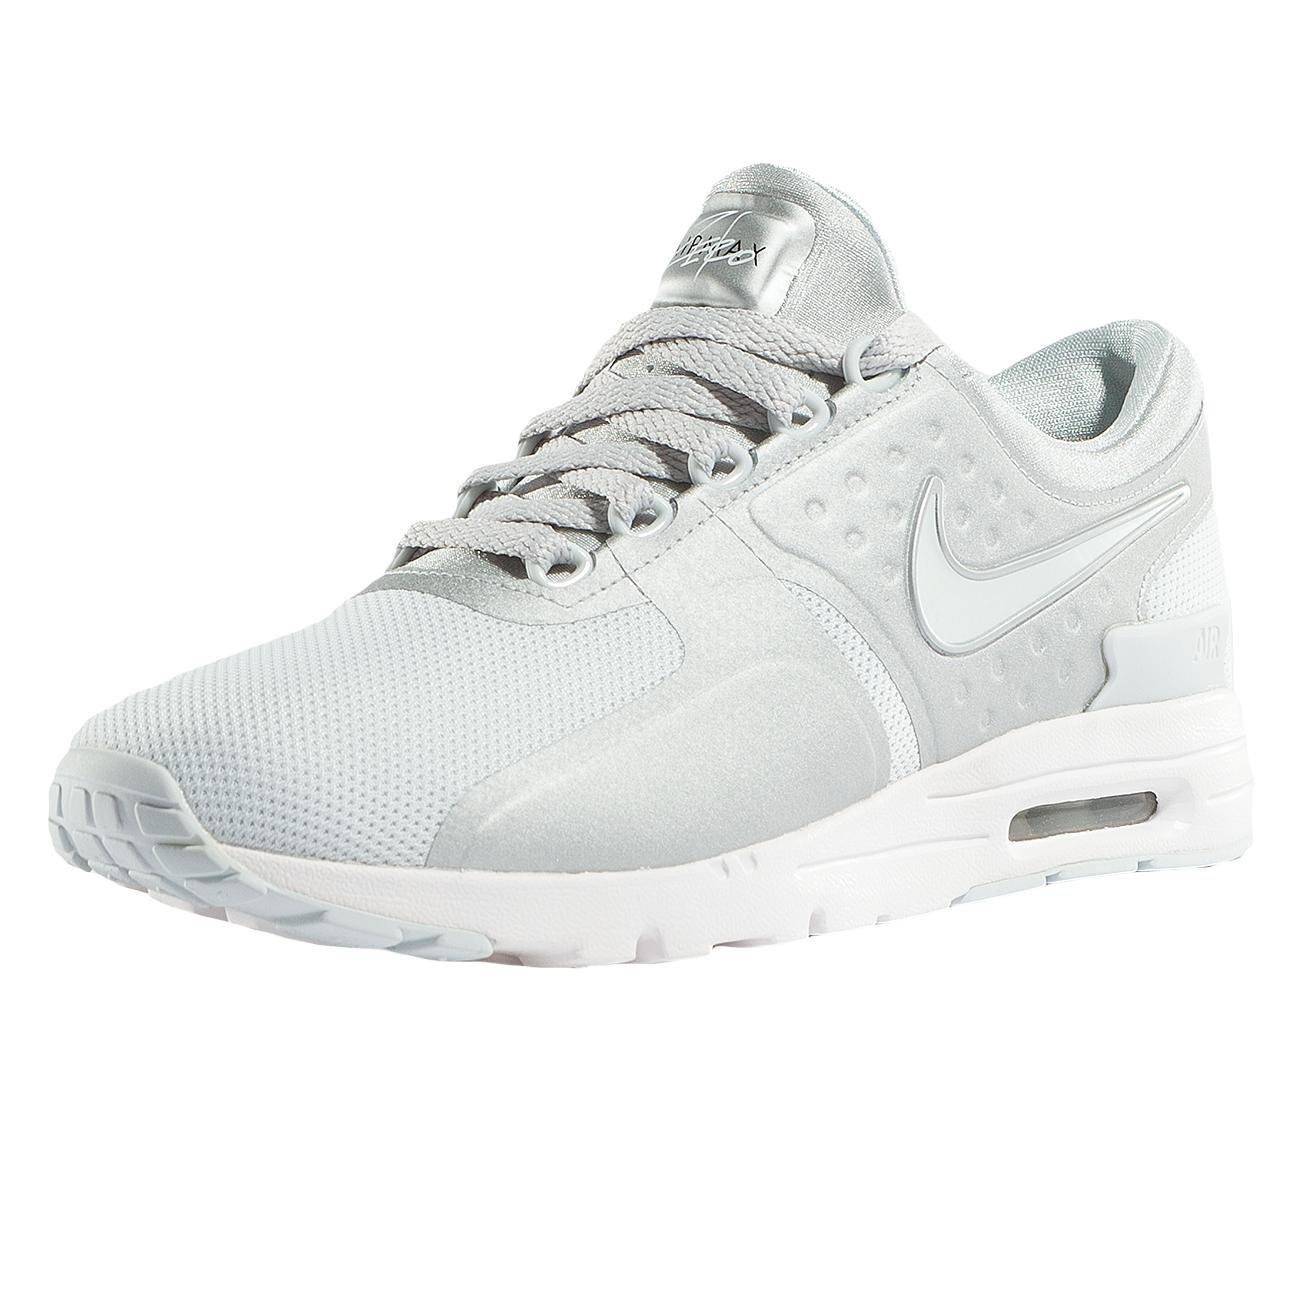 best sneakers 626a1 e8ea3 Galleon - NIKE Air Max Zero Women s Running Shoes, Pure Platinum Pure  Platinum, 10 B(M) US